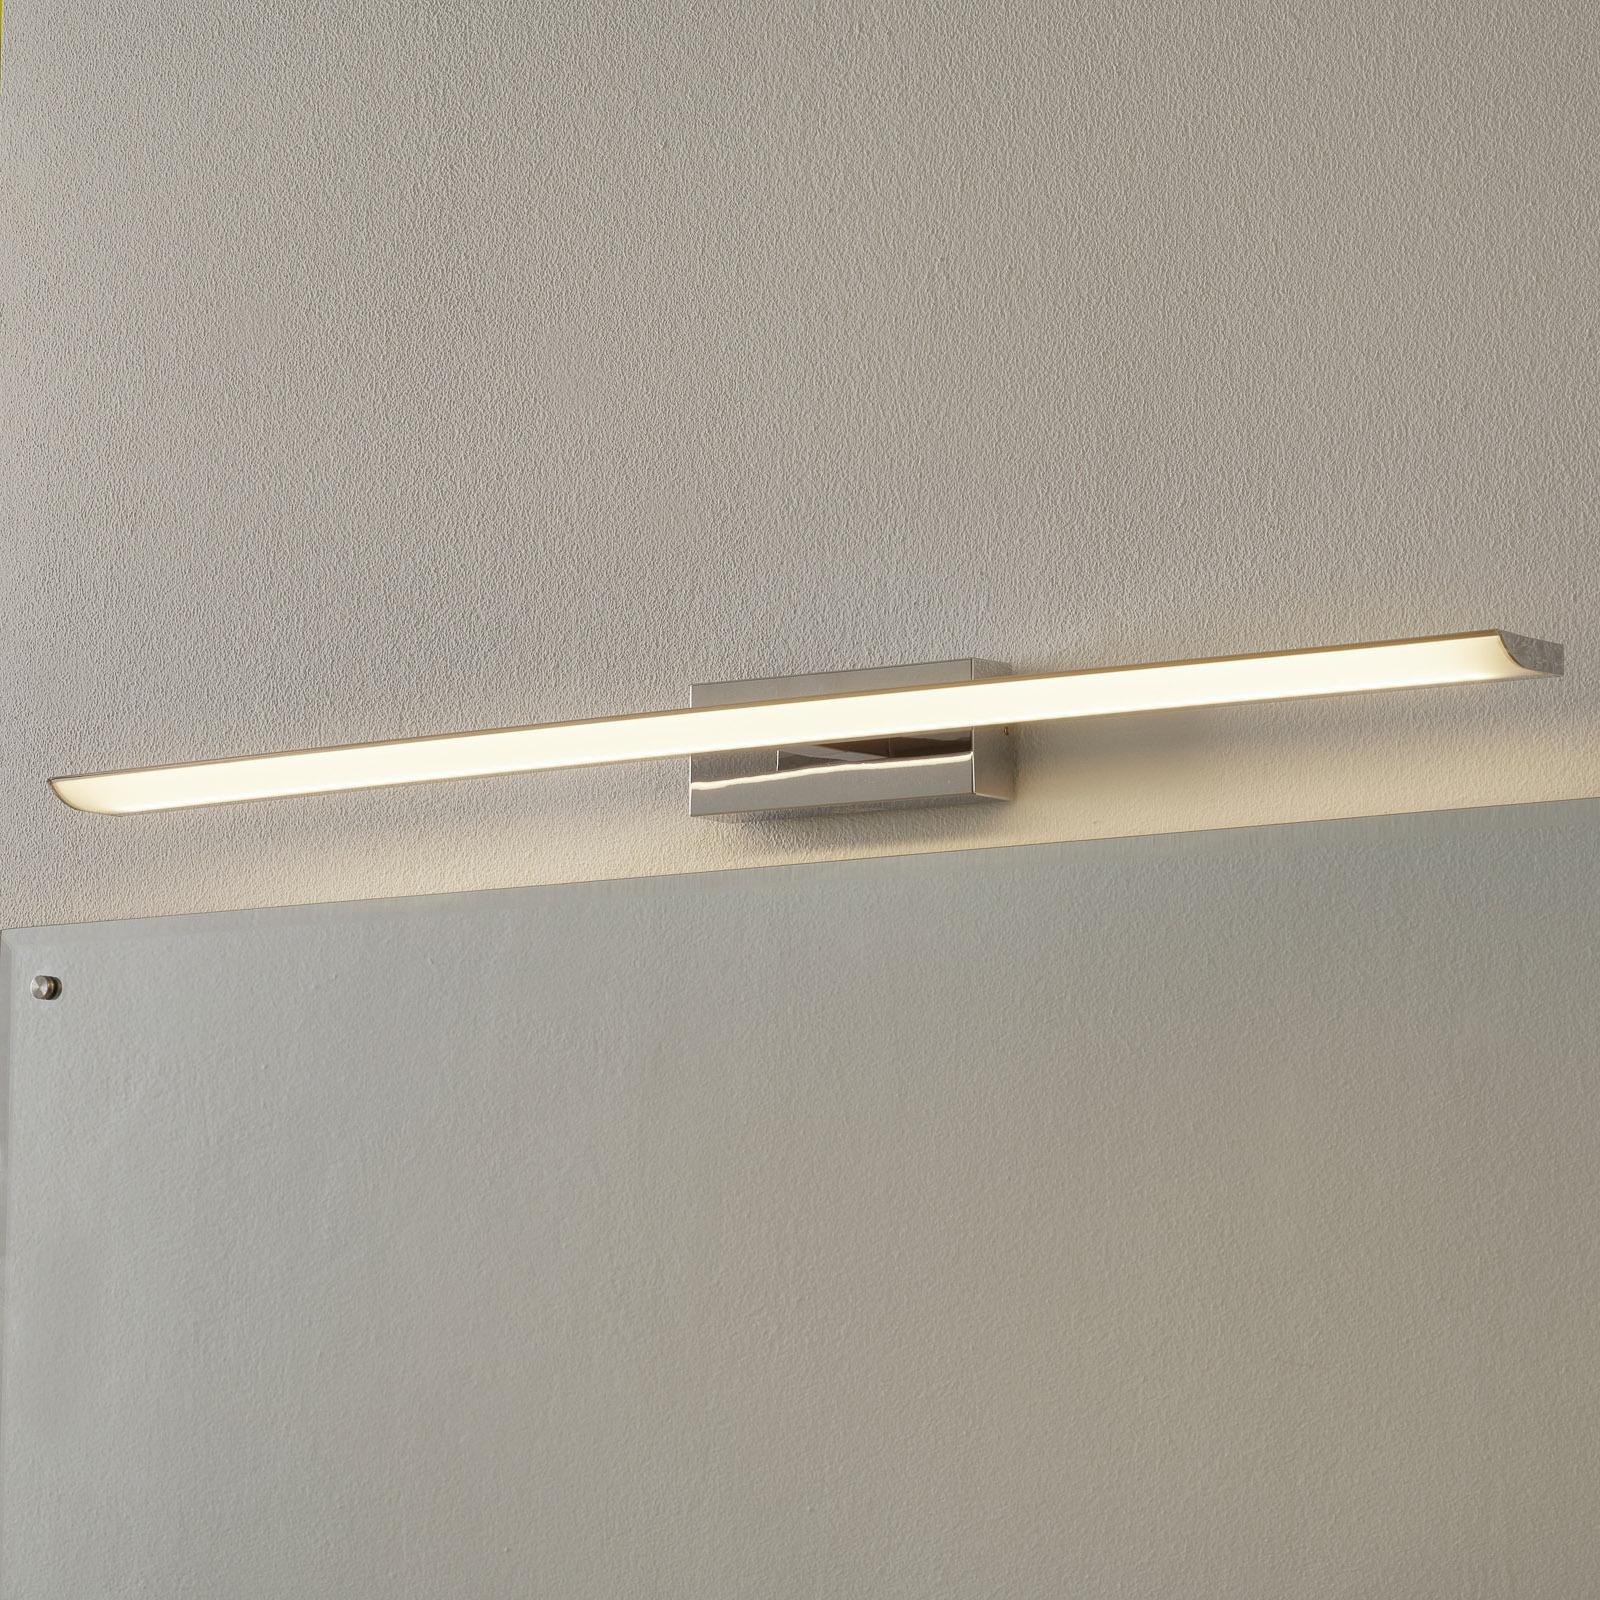 EGLO connect Tabiano-C LED-Spiegelleuchte 90,5 cm